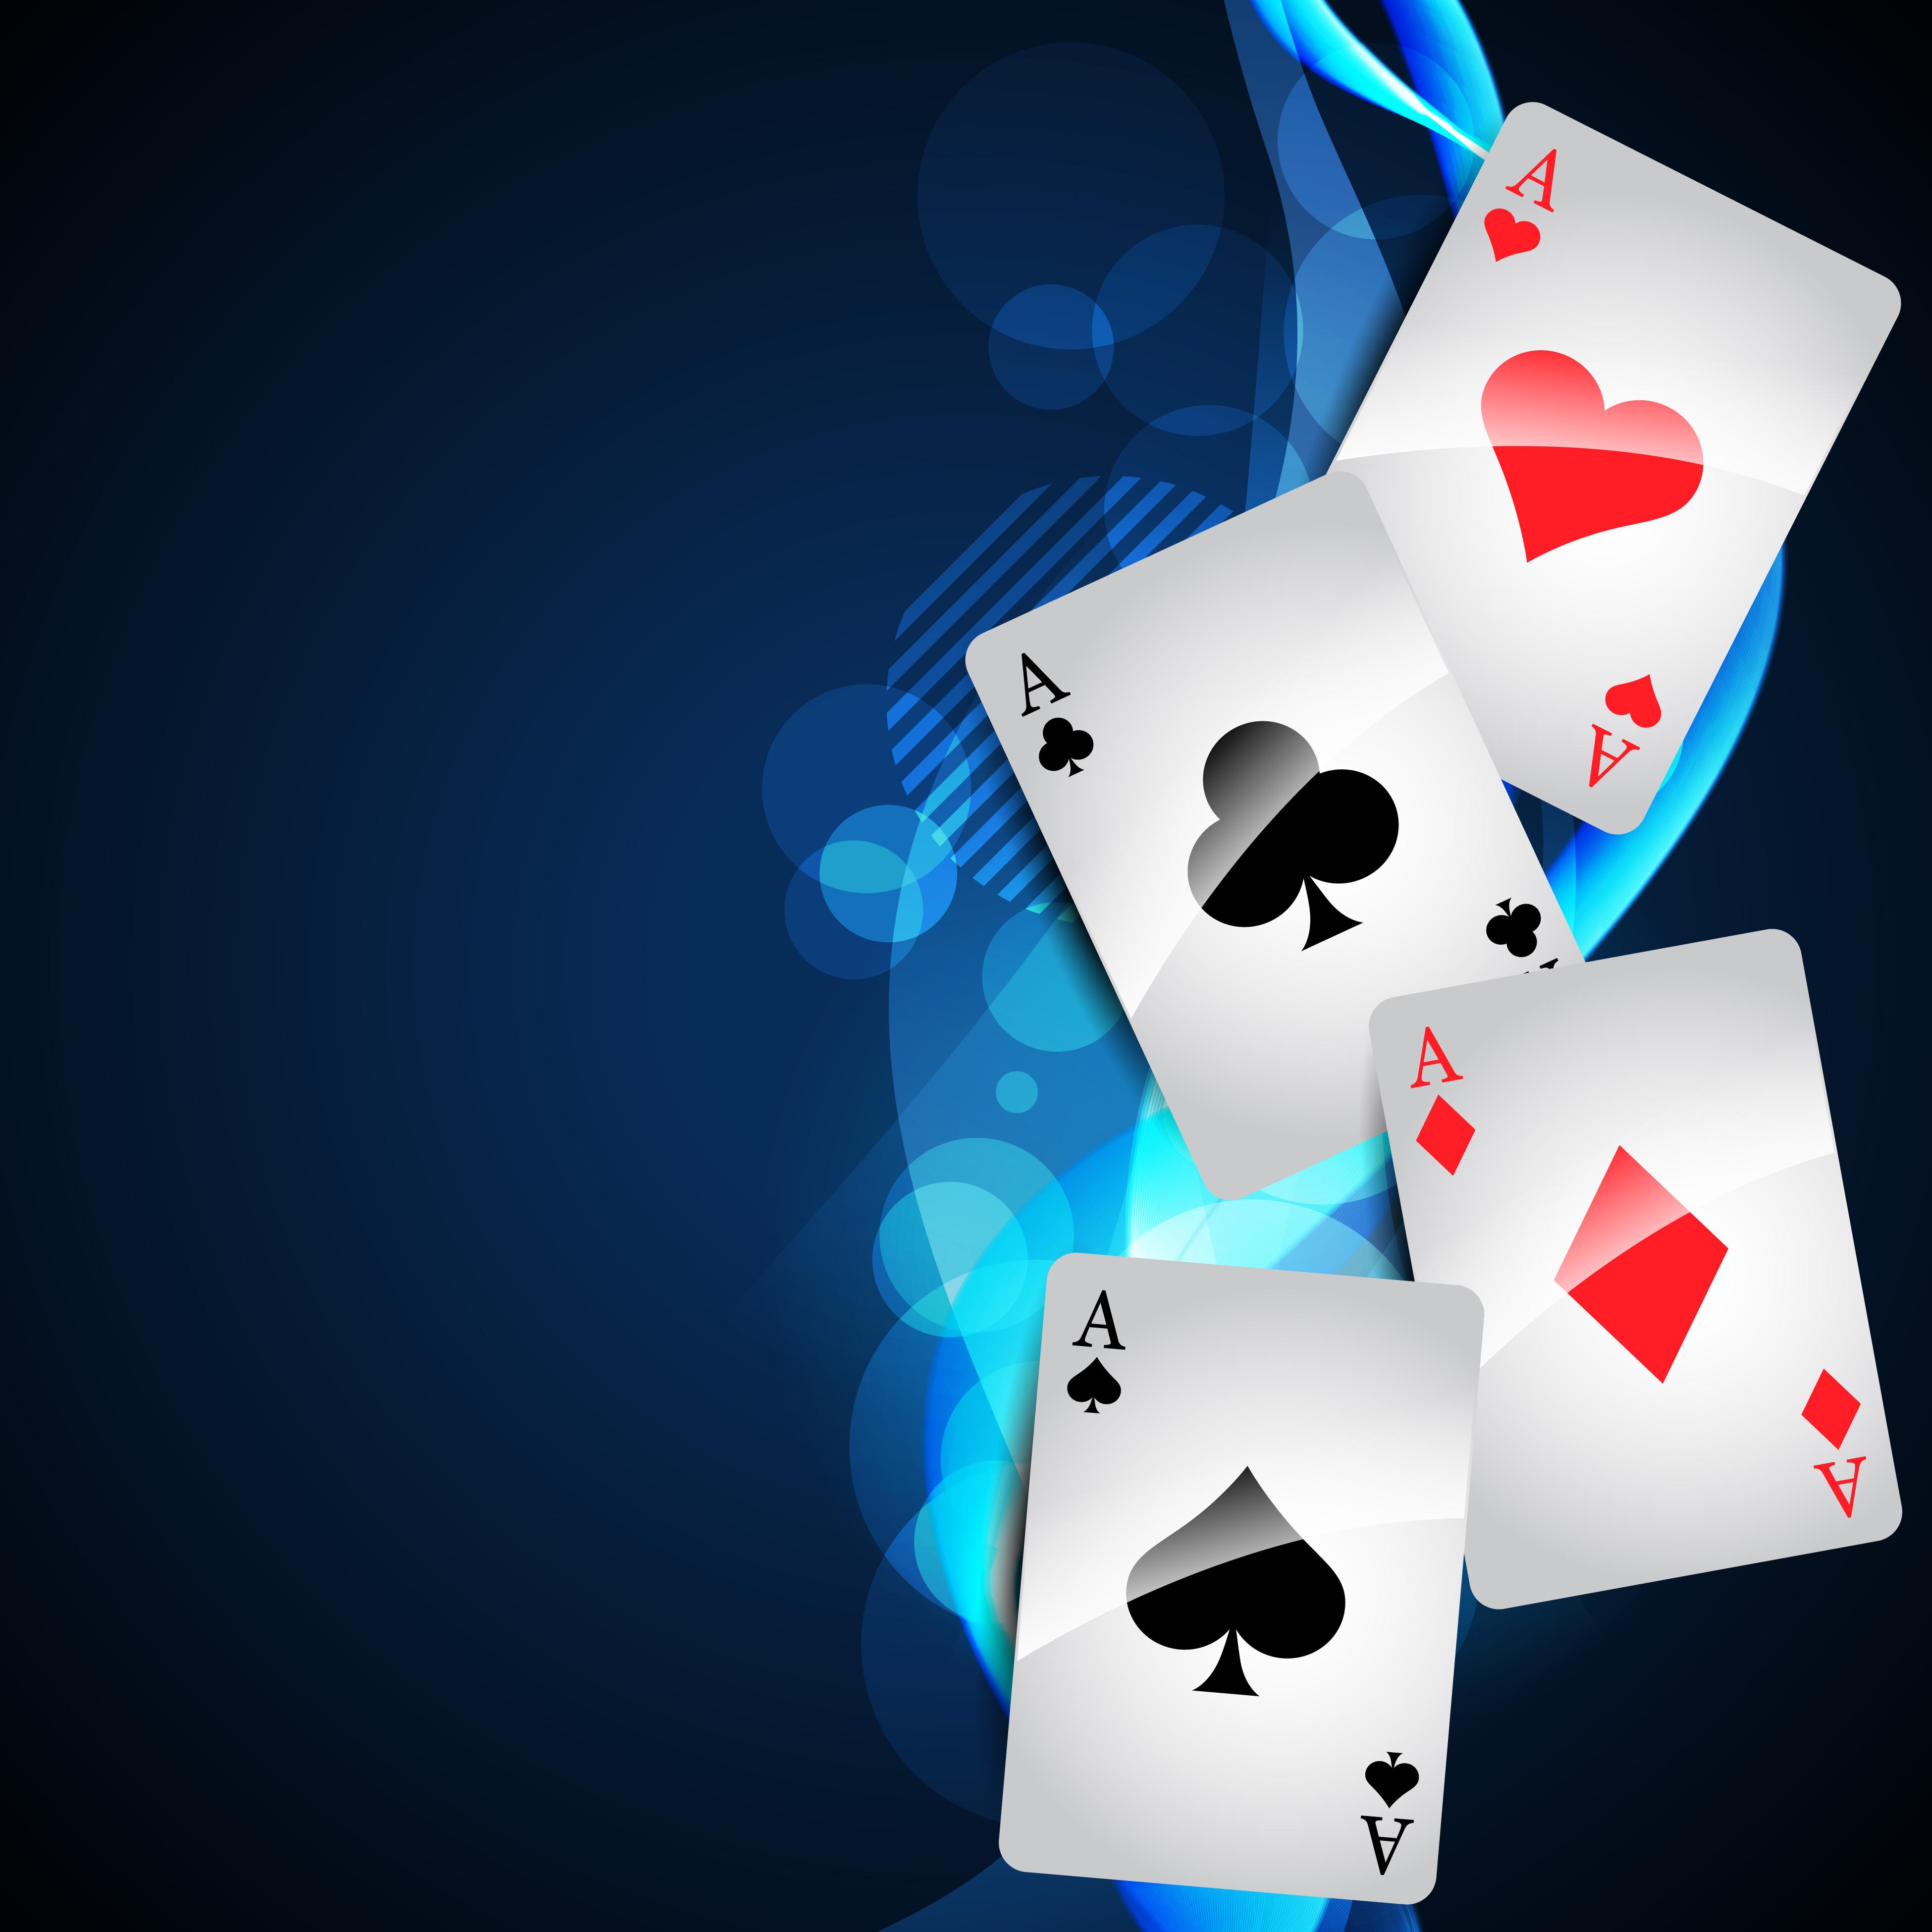 Thailand,Indonesia & Korean -900 Unique PBN Posts,UFAbet,Casino,Poker,Gambling,Betting Sites